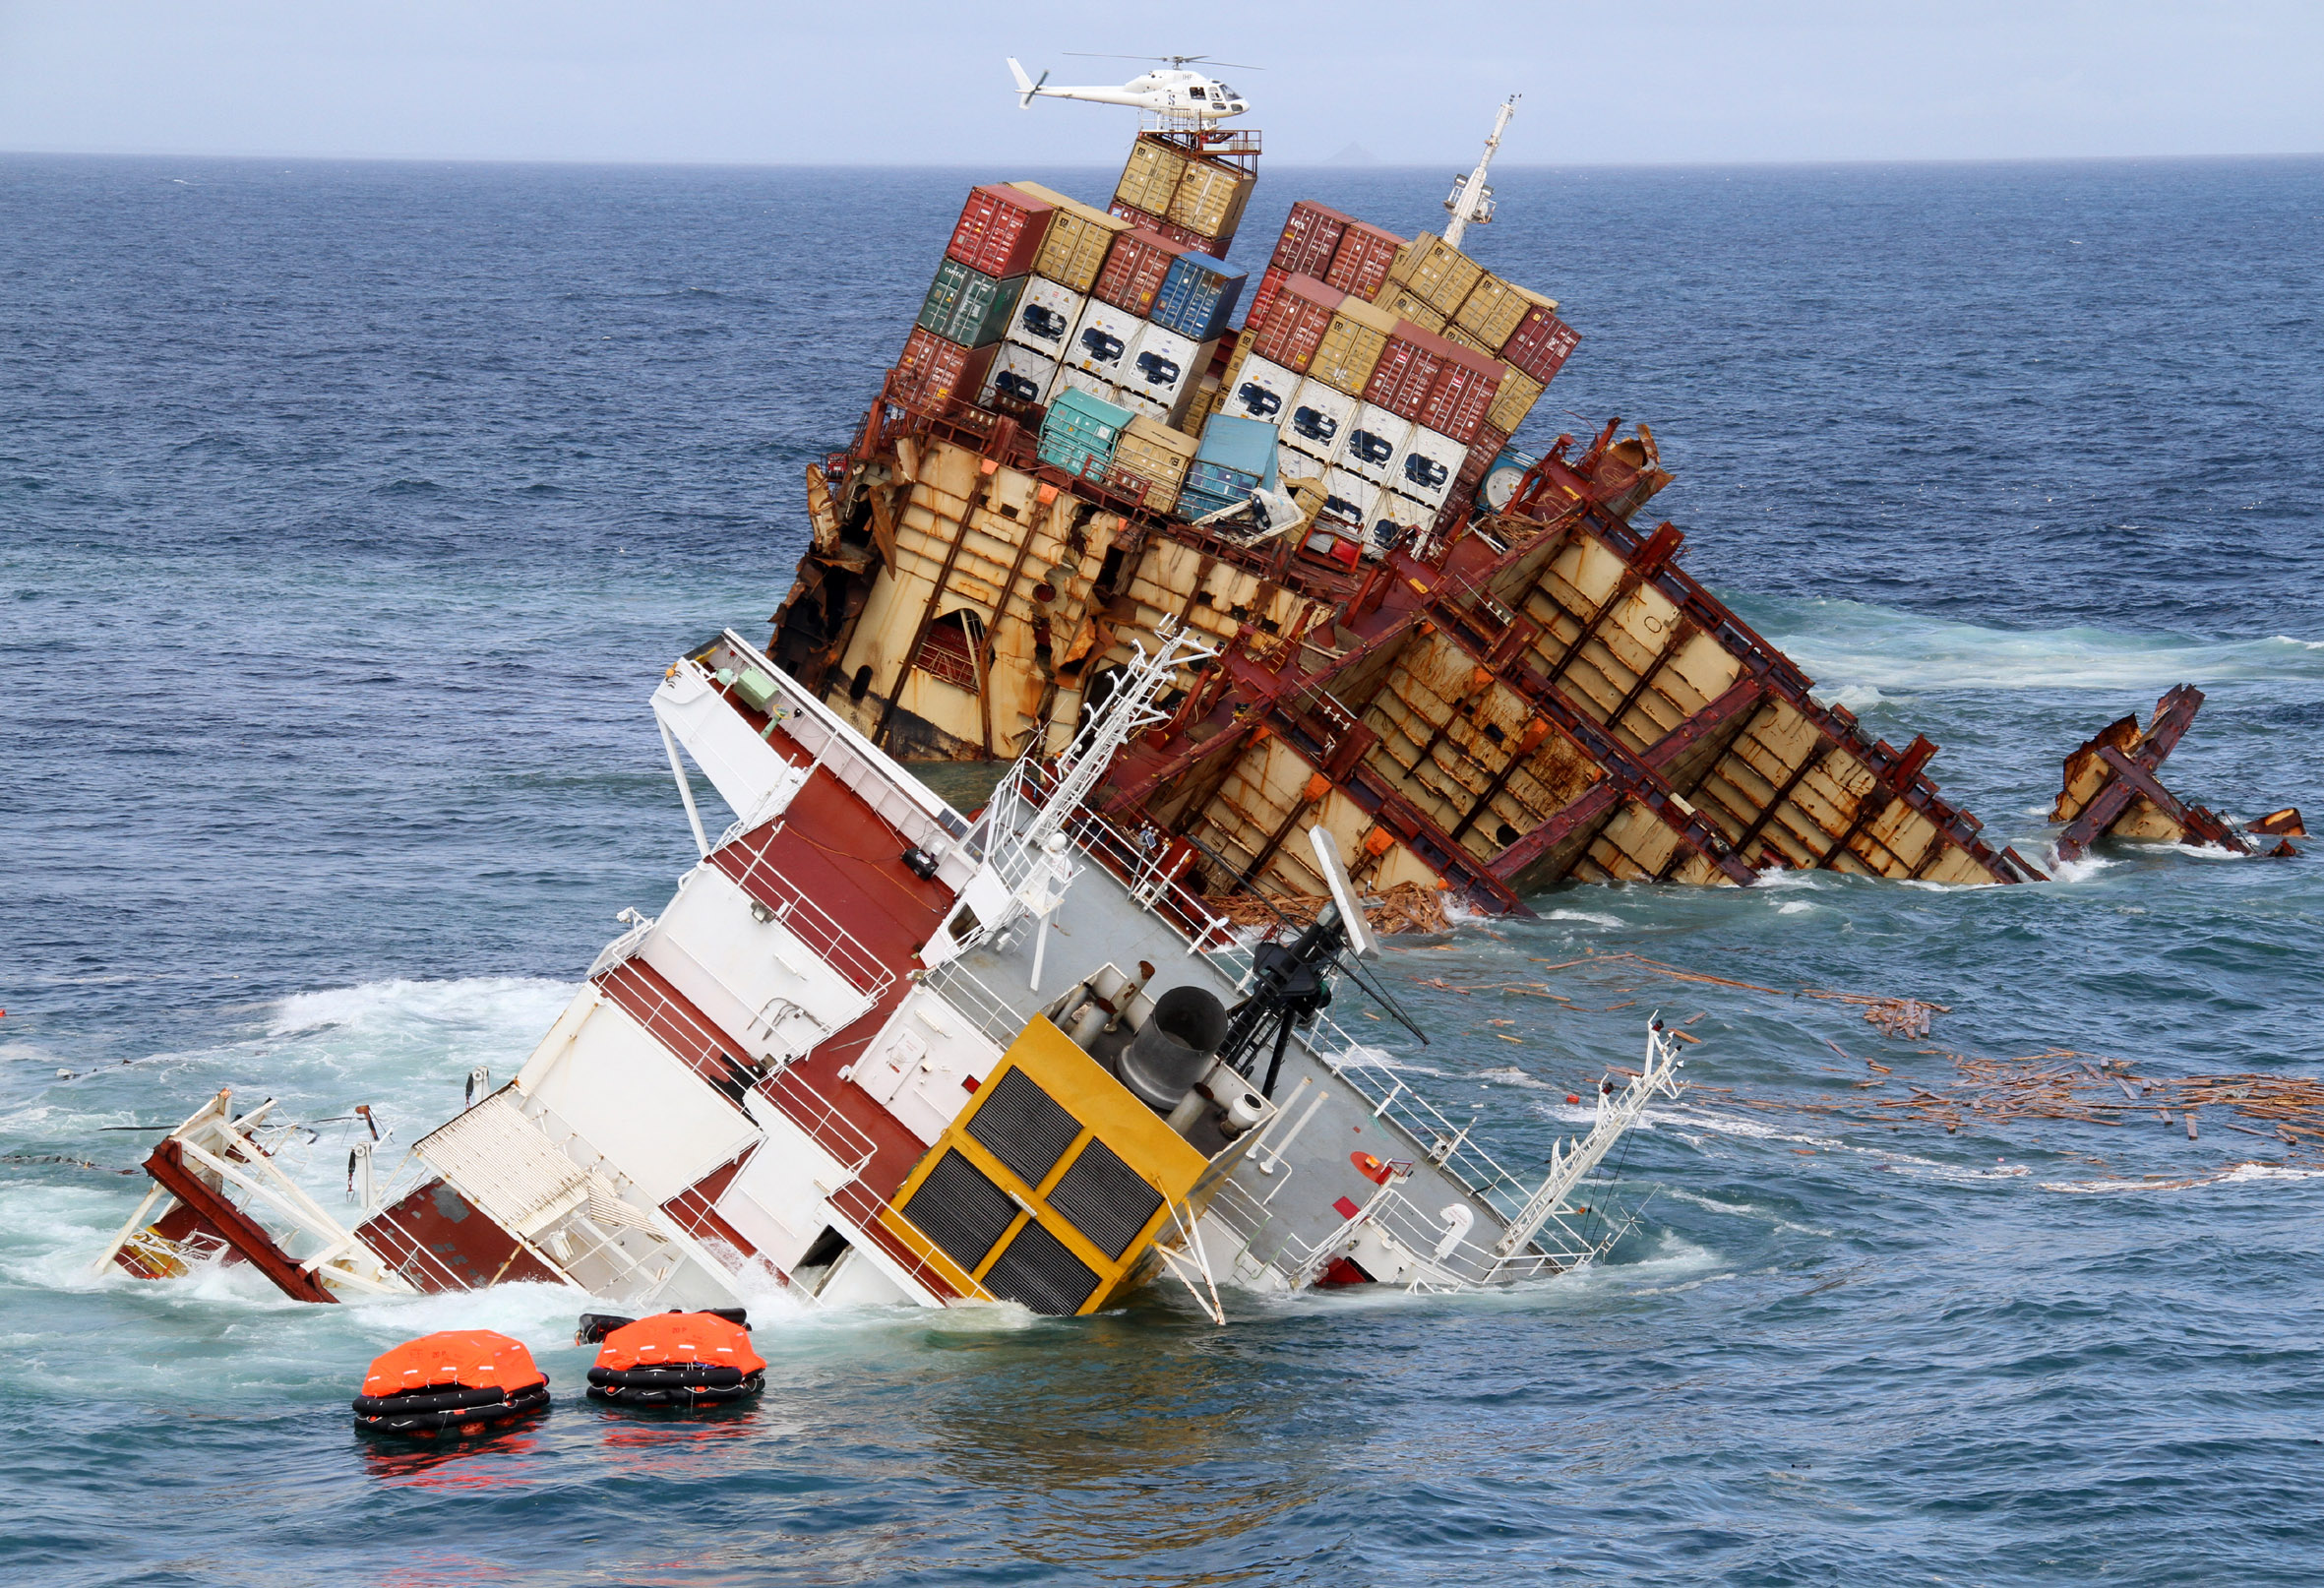 More Photos Of The Rena Shipwreck Log